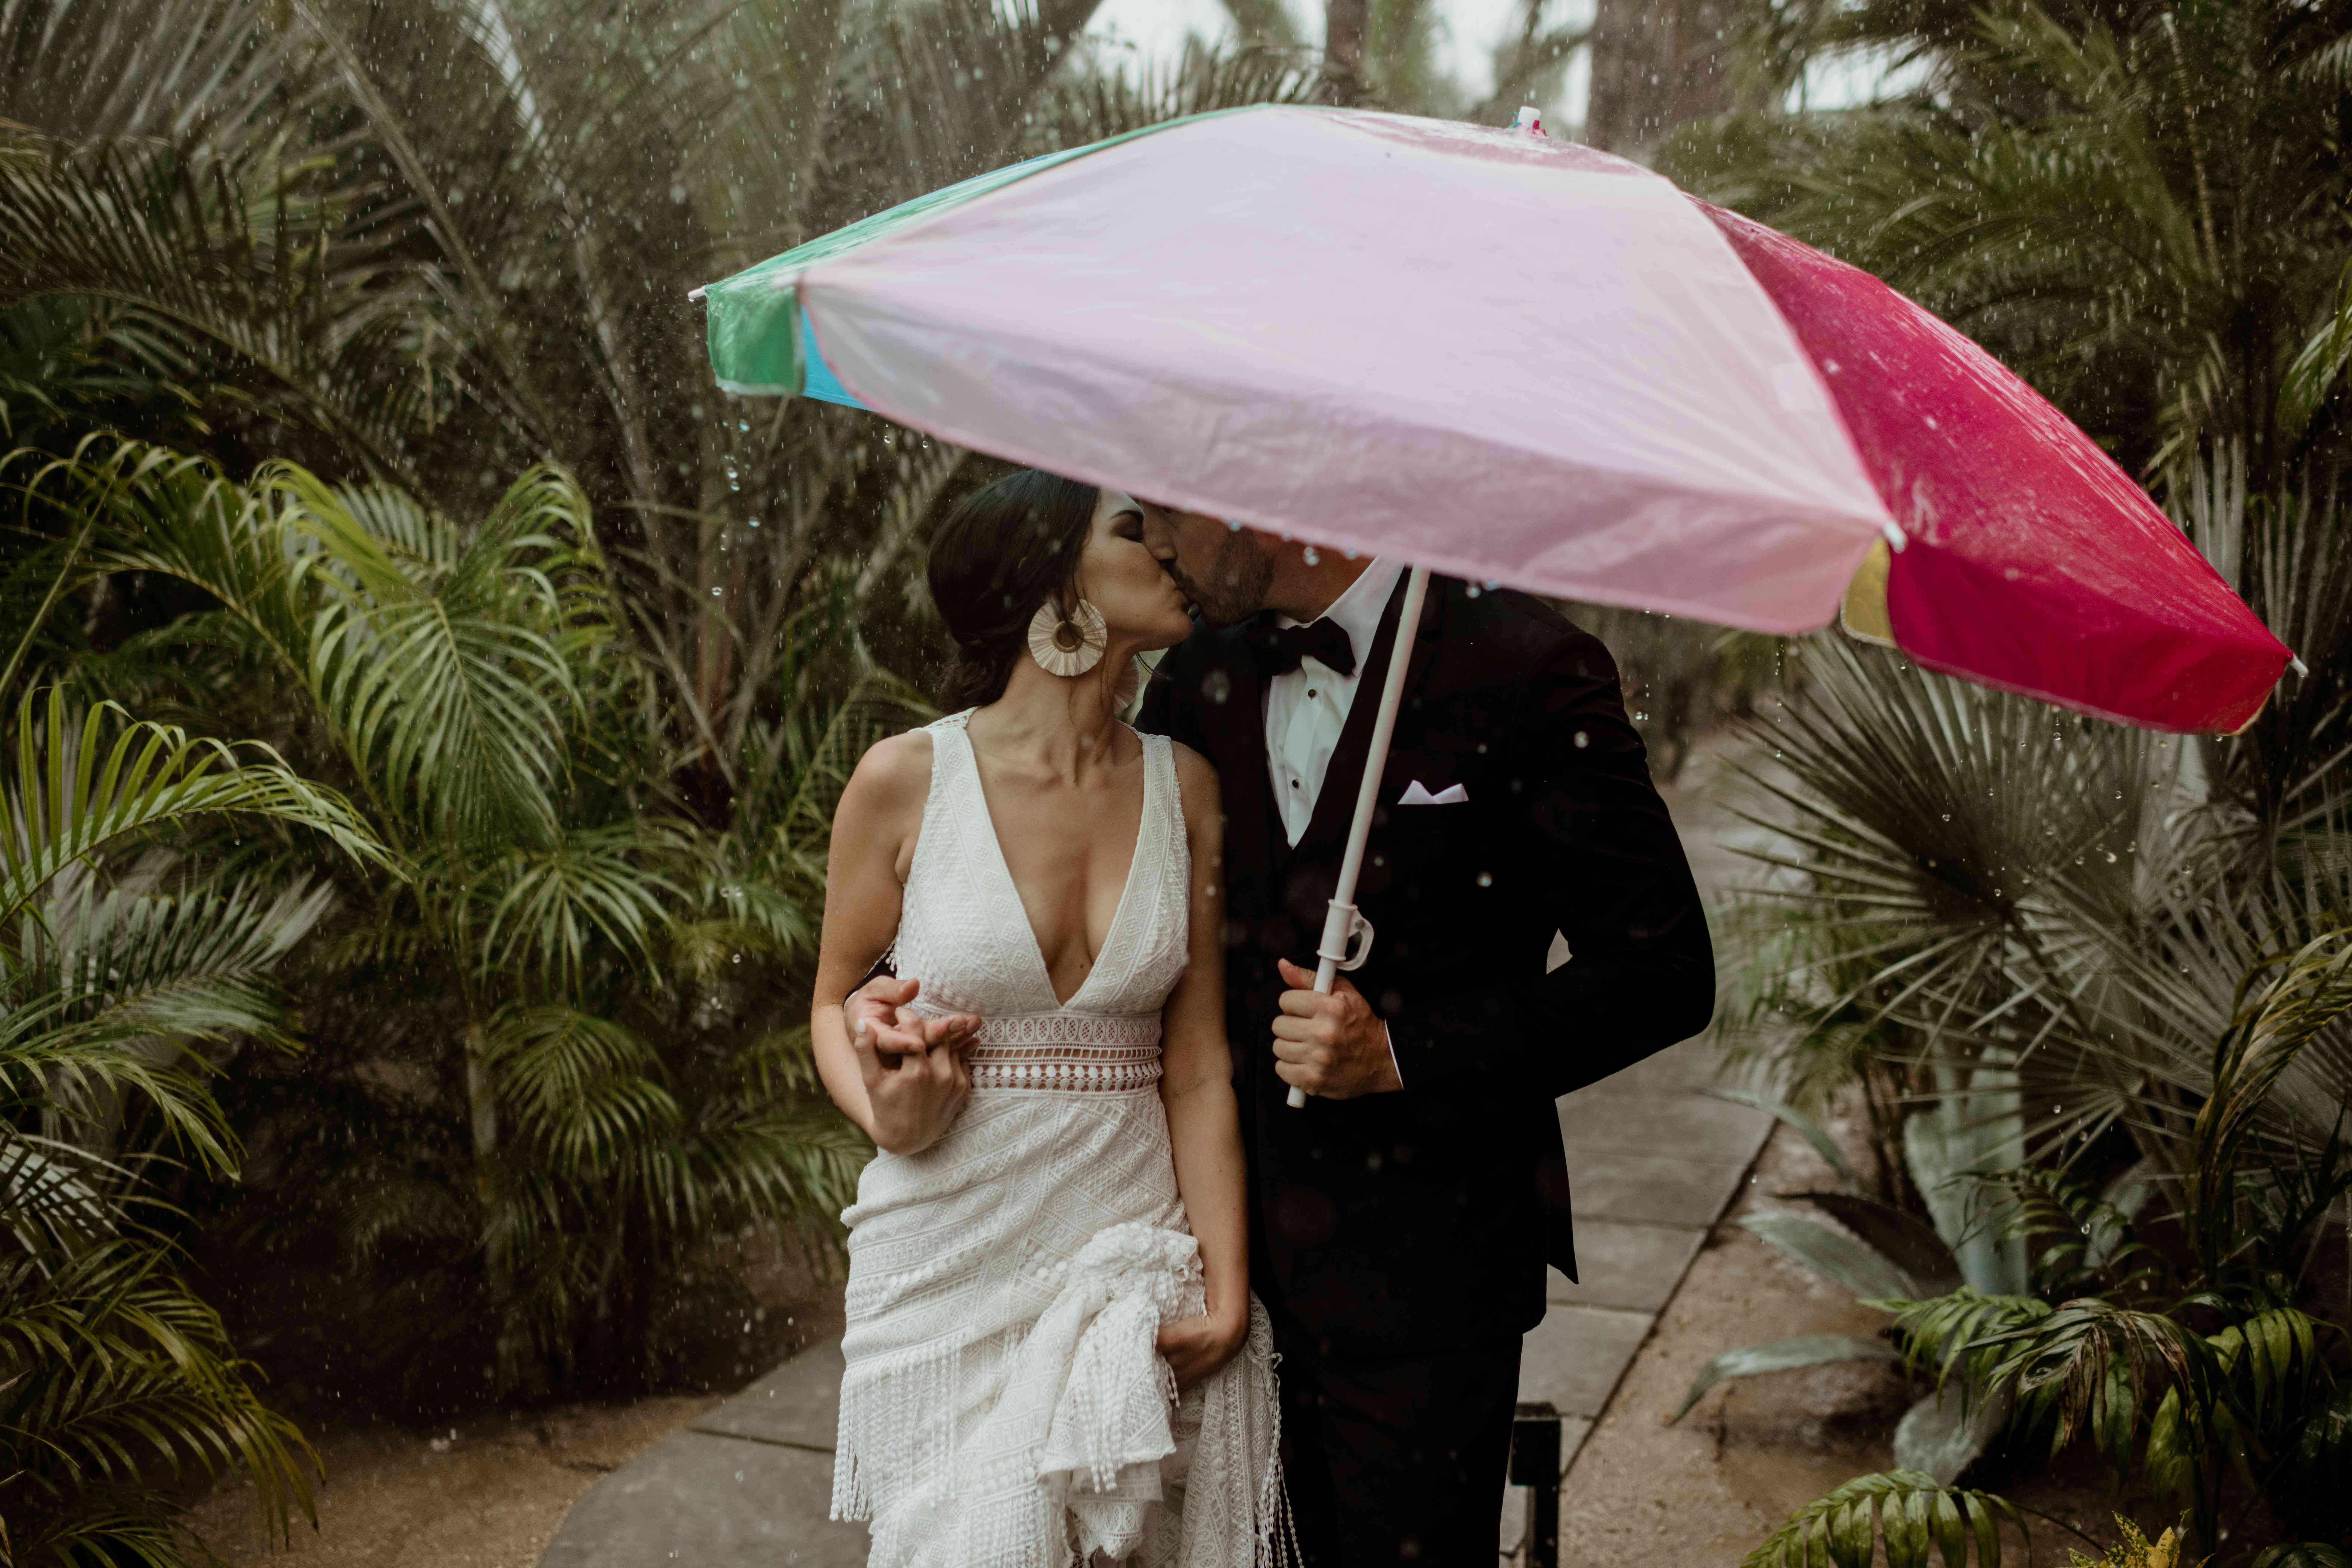 Newlyweds kissing under beach umbrella in the rain